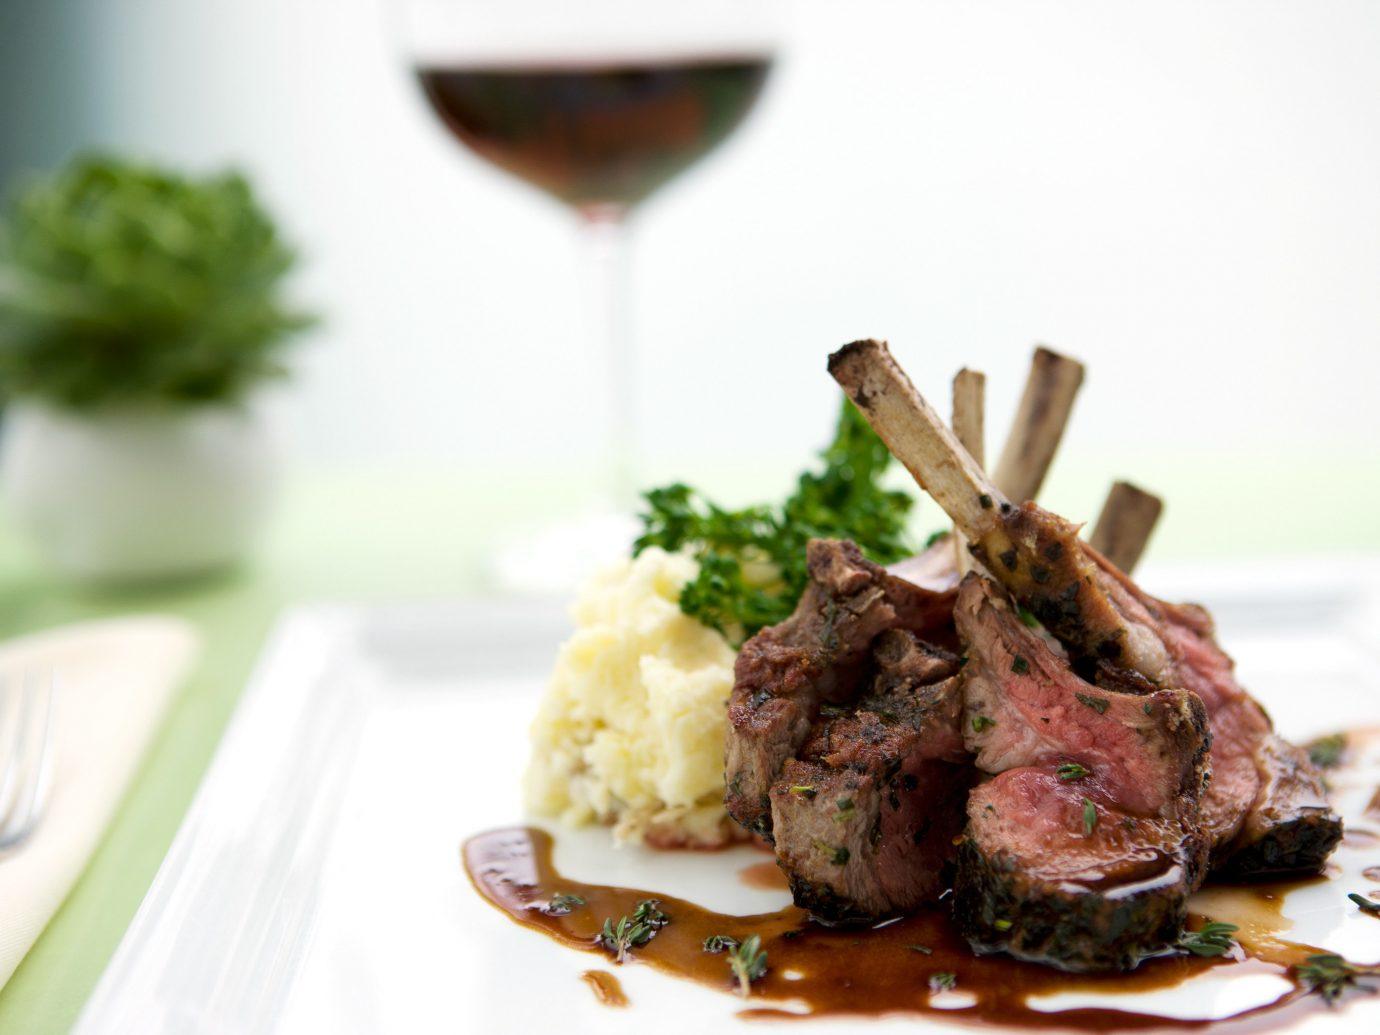 Bar Beach Dining Drink Eat Modern plate food table dish meat cuisine meal white restaurant fork sense produce dinner piece de resistance